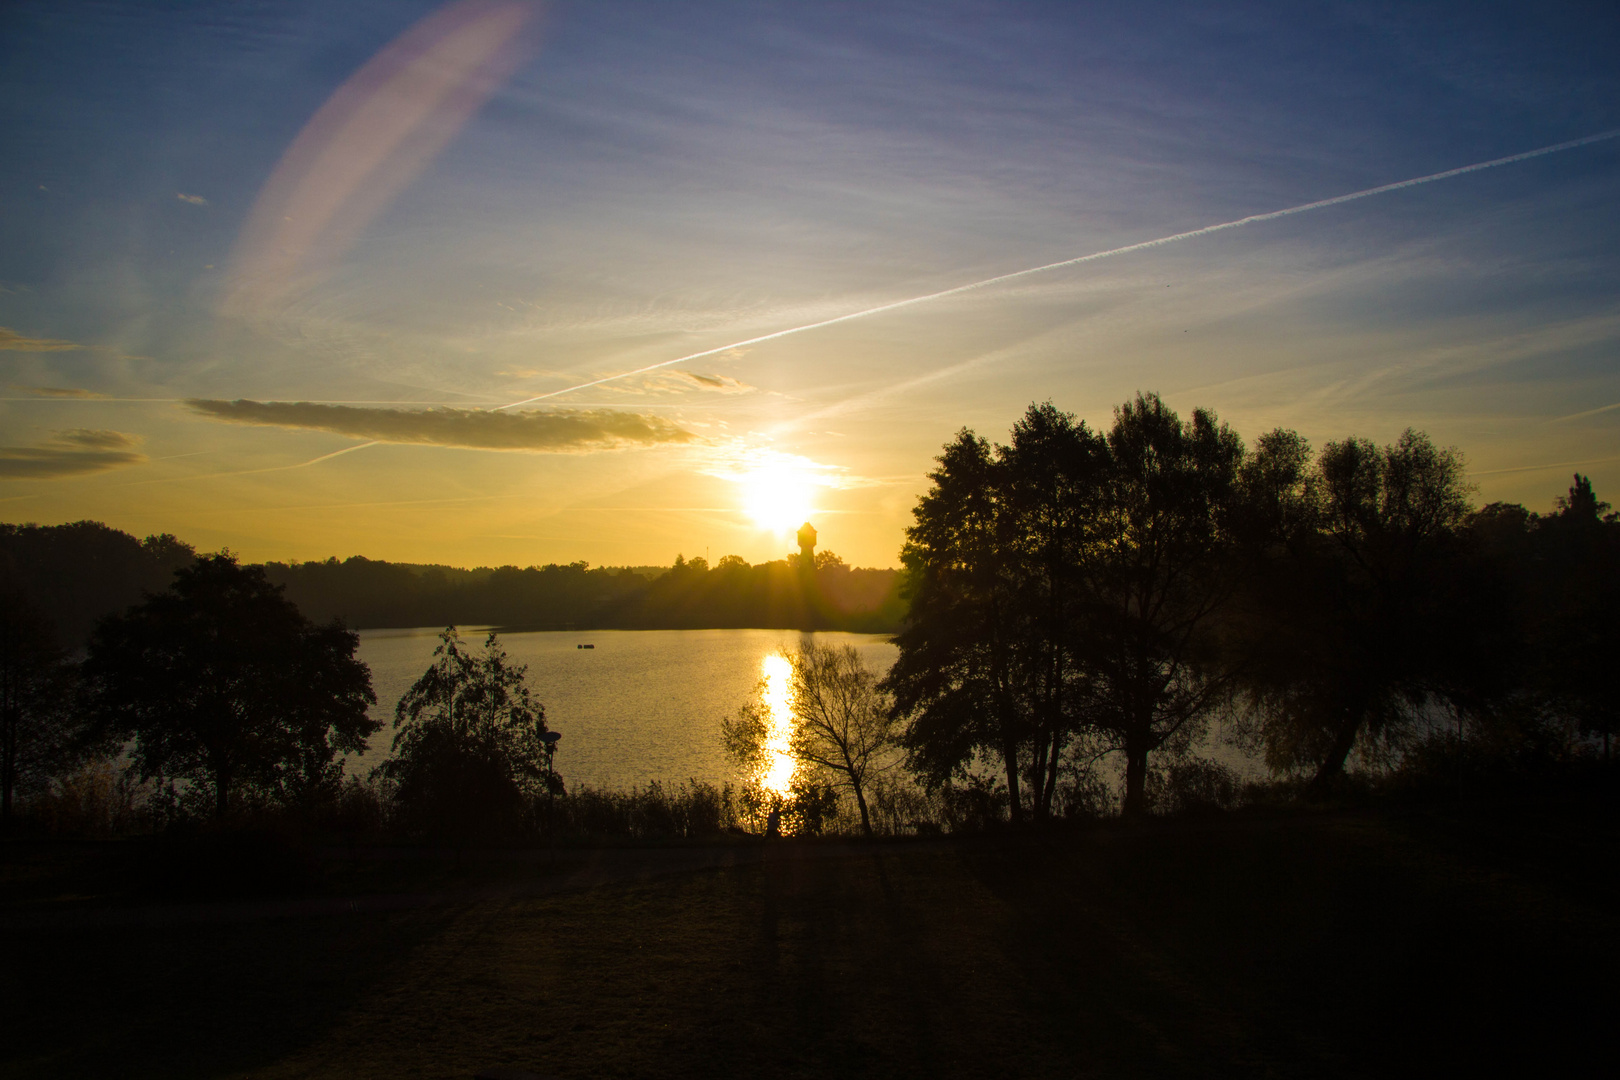 Sonnenaufgang am Glambecker See